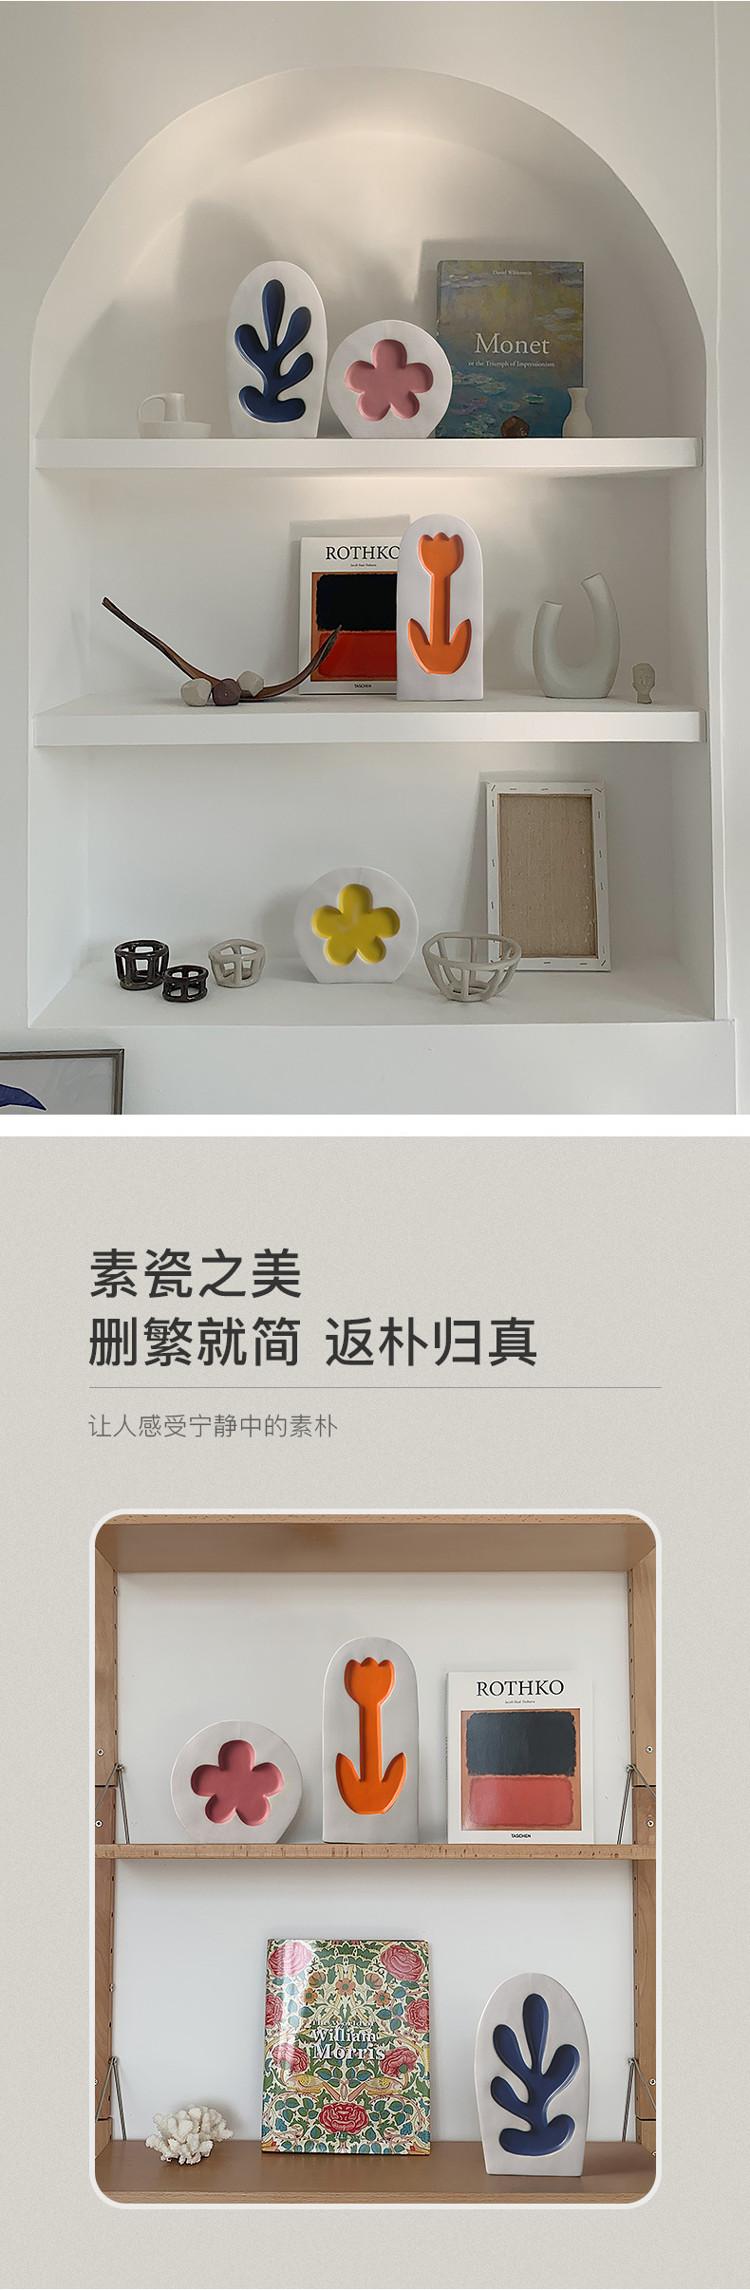 1JC21080 Instagram Vase New Trend Online Sale (8)